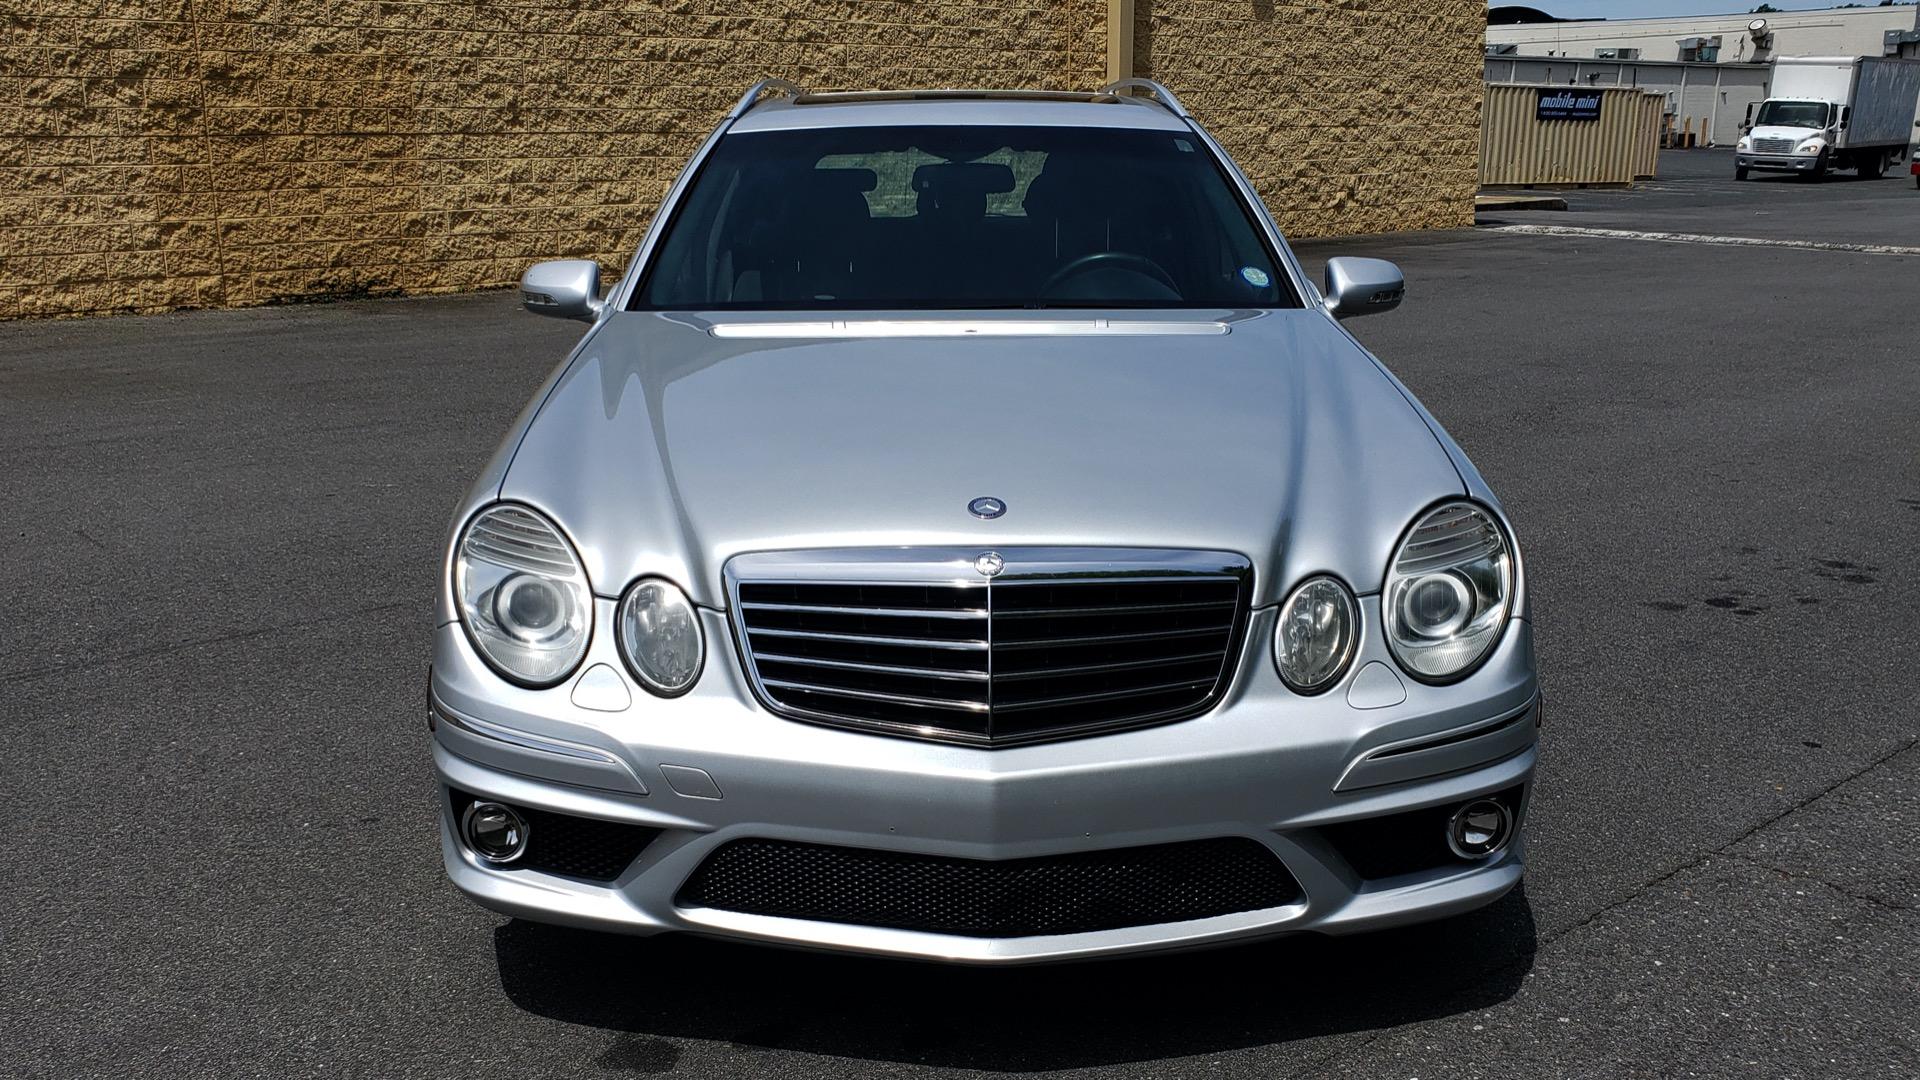 Used 2007 Mercedes-Benz E-Class E63 AMG WAGON / NAV / SUNROOF / HARMAN/KARDON for sale $29,000 at Formula Imports in Charlotte NC 28227 31